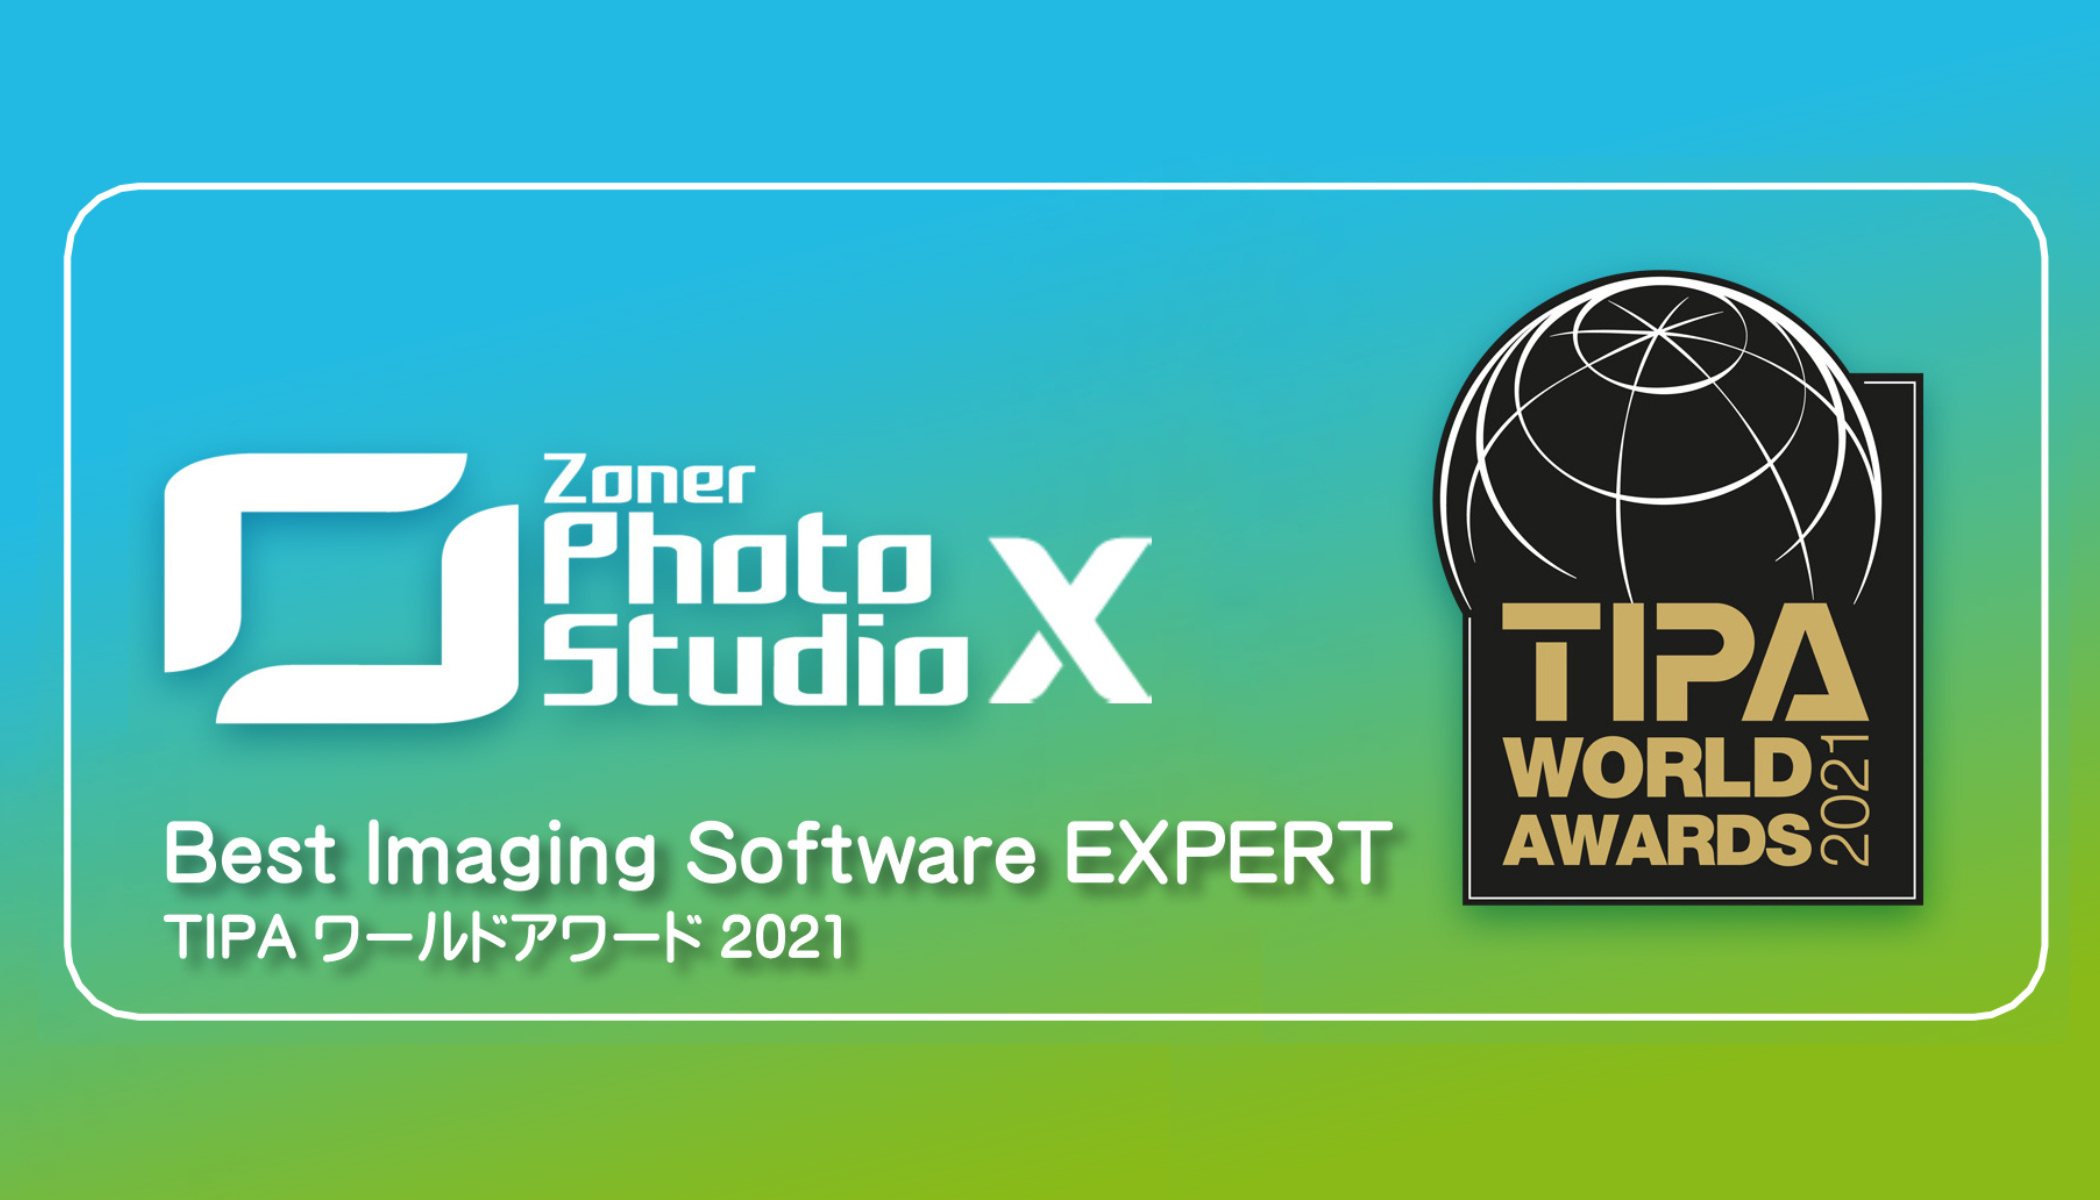 Zoner Photo Studio X & TIPA World Award 2021